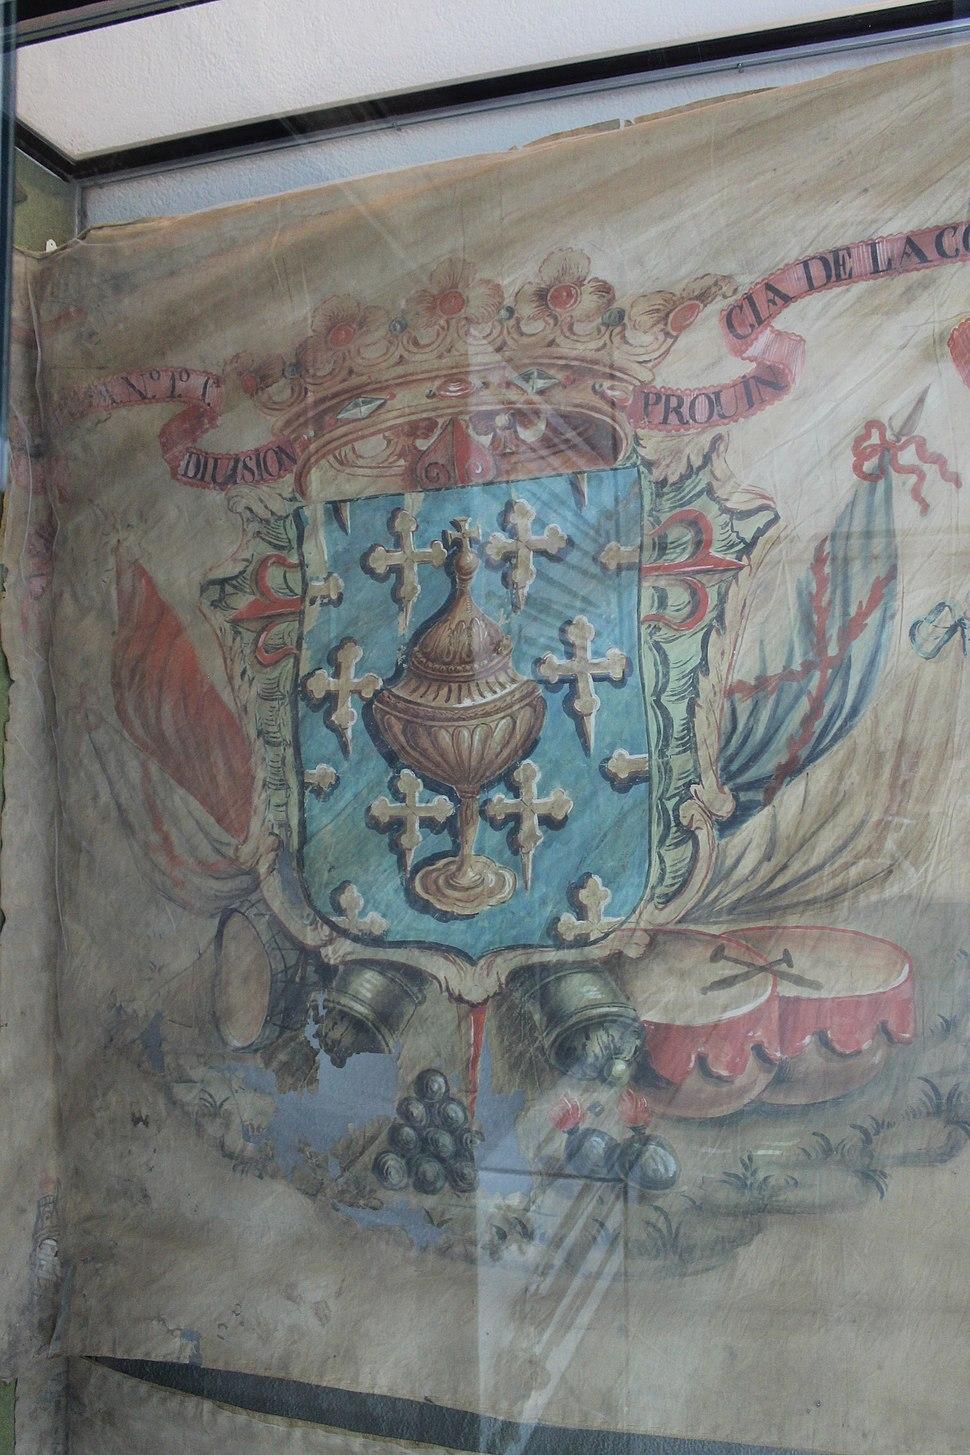 Rexemento - Reino de Galicia - 1810